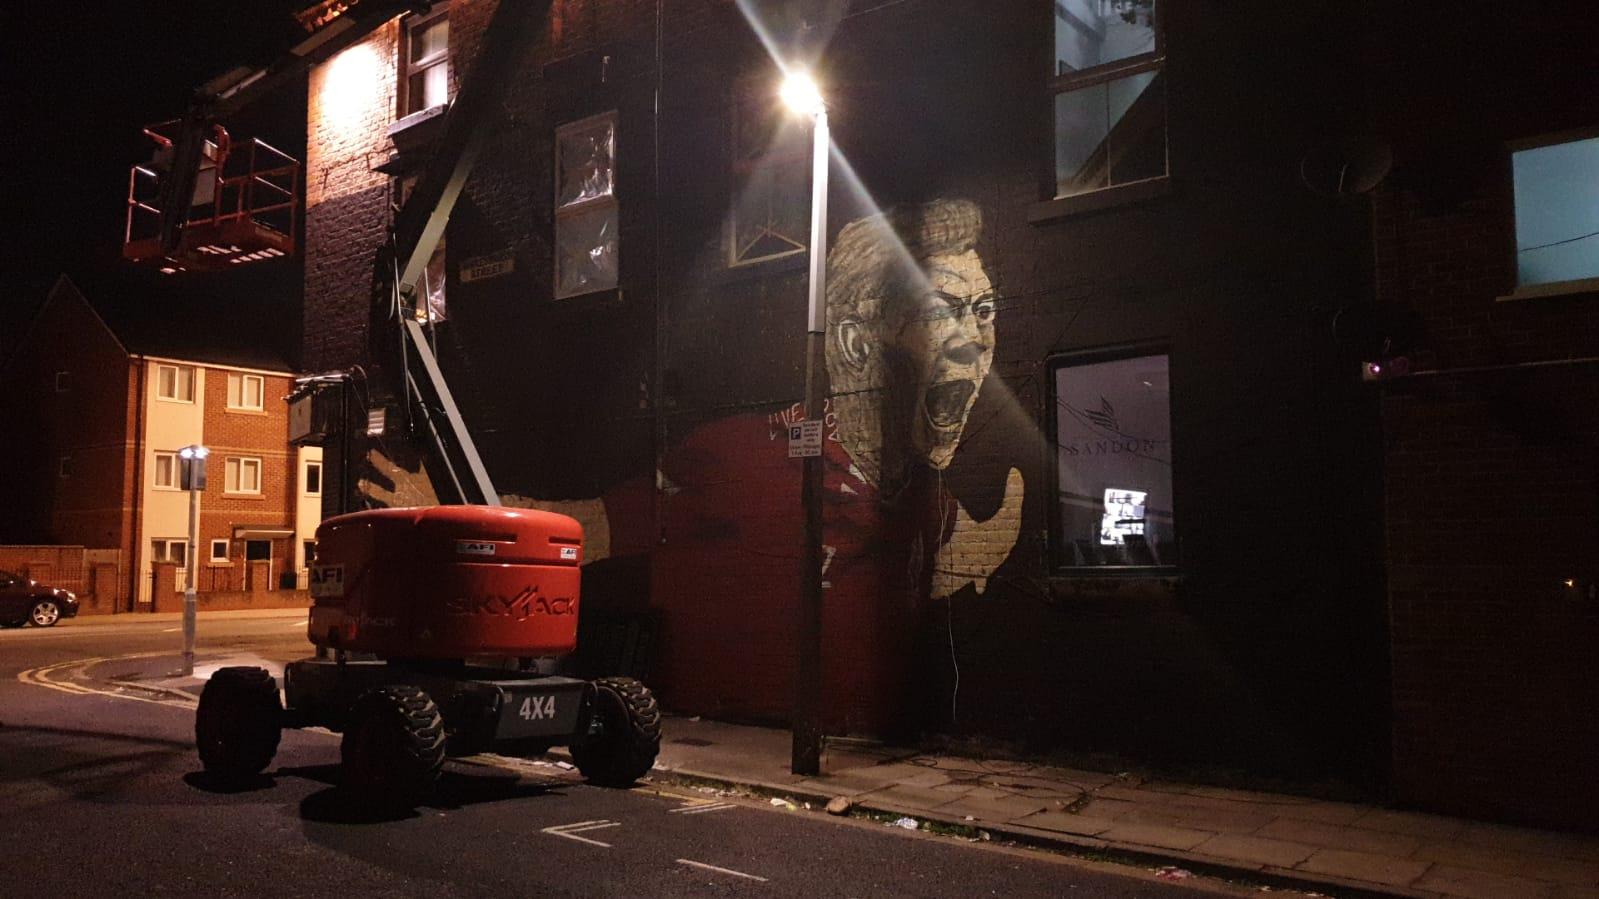 (Photos) New Steven Gerrard mural pops up in Liverpool near Anfield